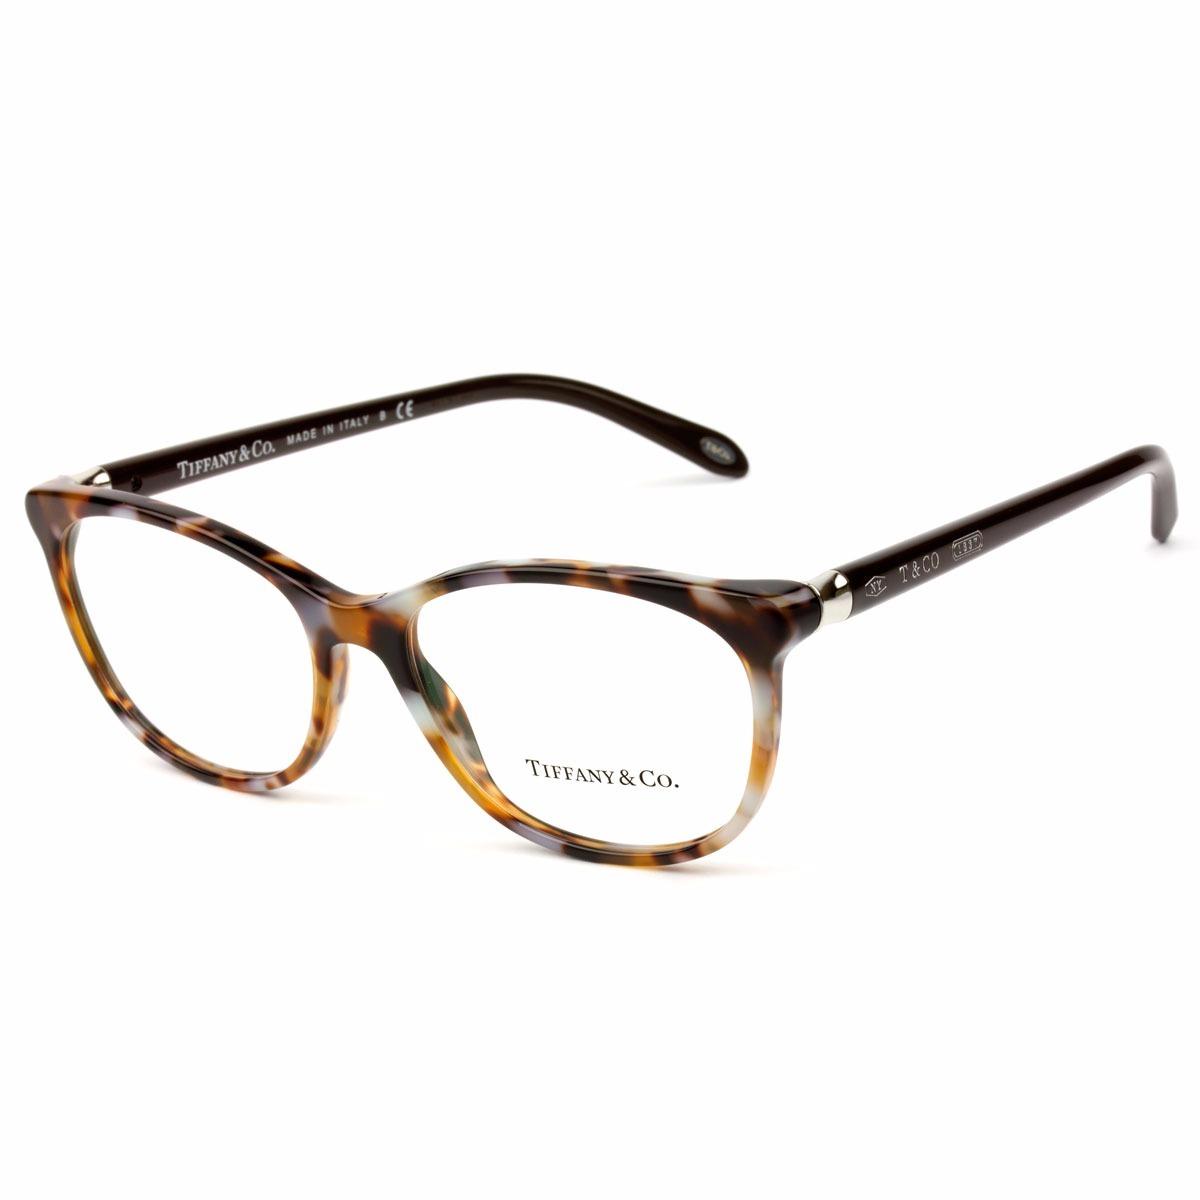 94a054cdef13f Óculos De Grau Tiffany   Co Tf 2135 8212 54 - Nota Fiscal - R  1.049 ...